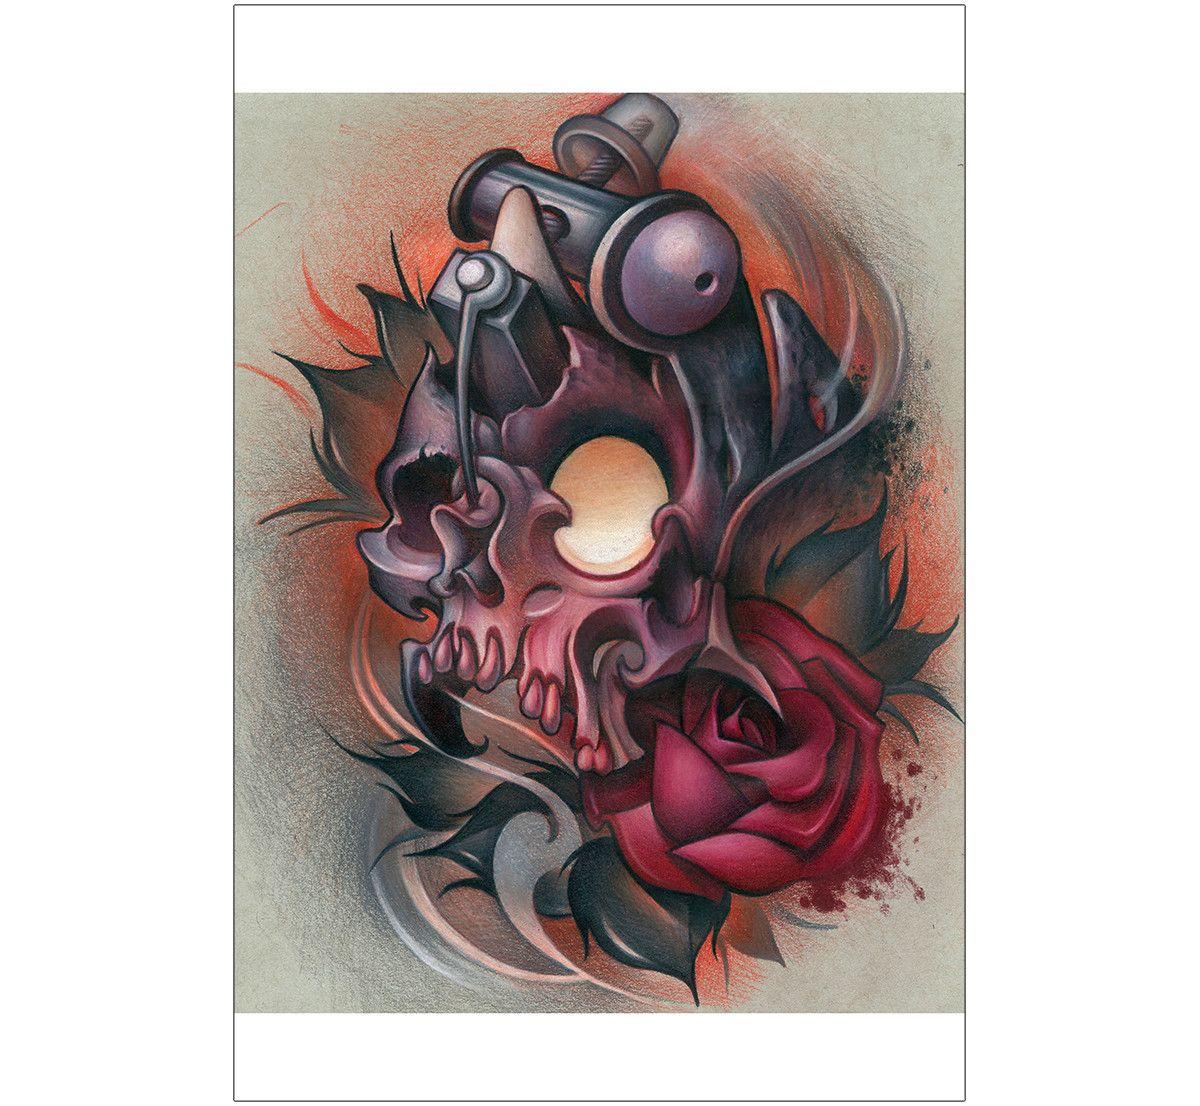 Skull Machine By Timmy B New School Tattoo Design Biomechanical Rose